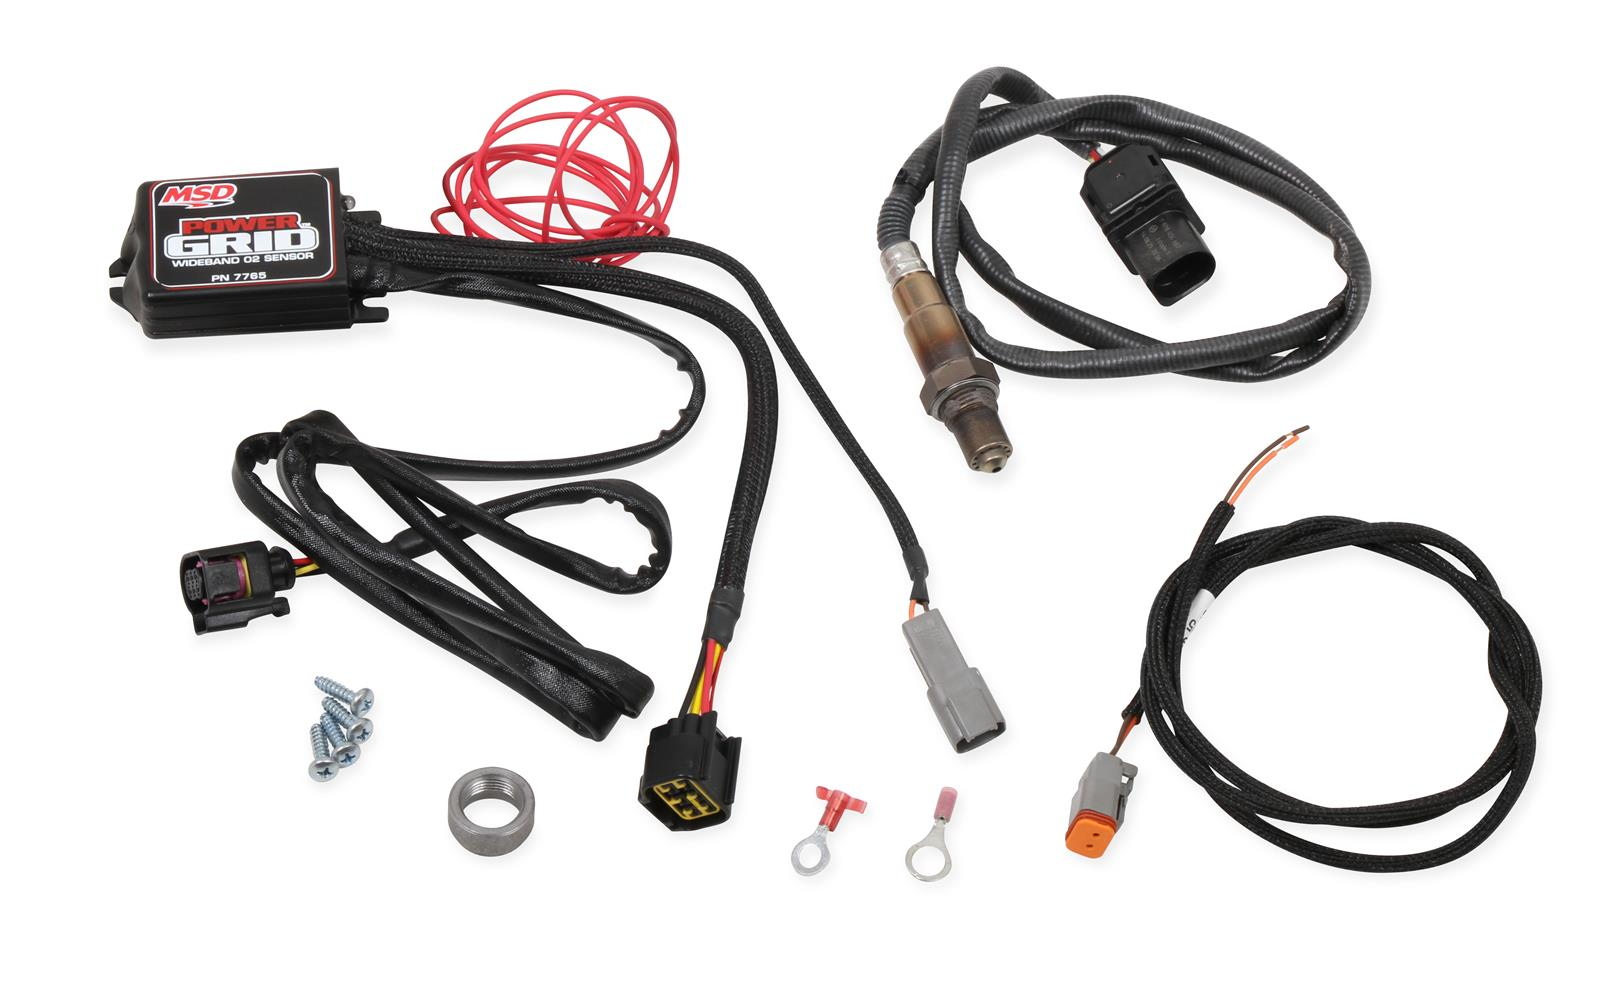 Msd Power Grid Wide Band Oxygen Sensor Modules